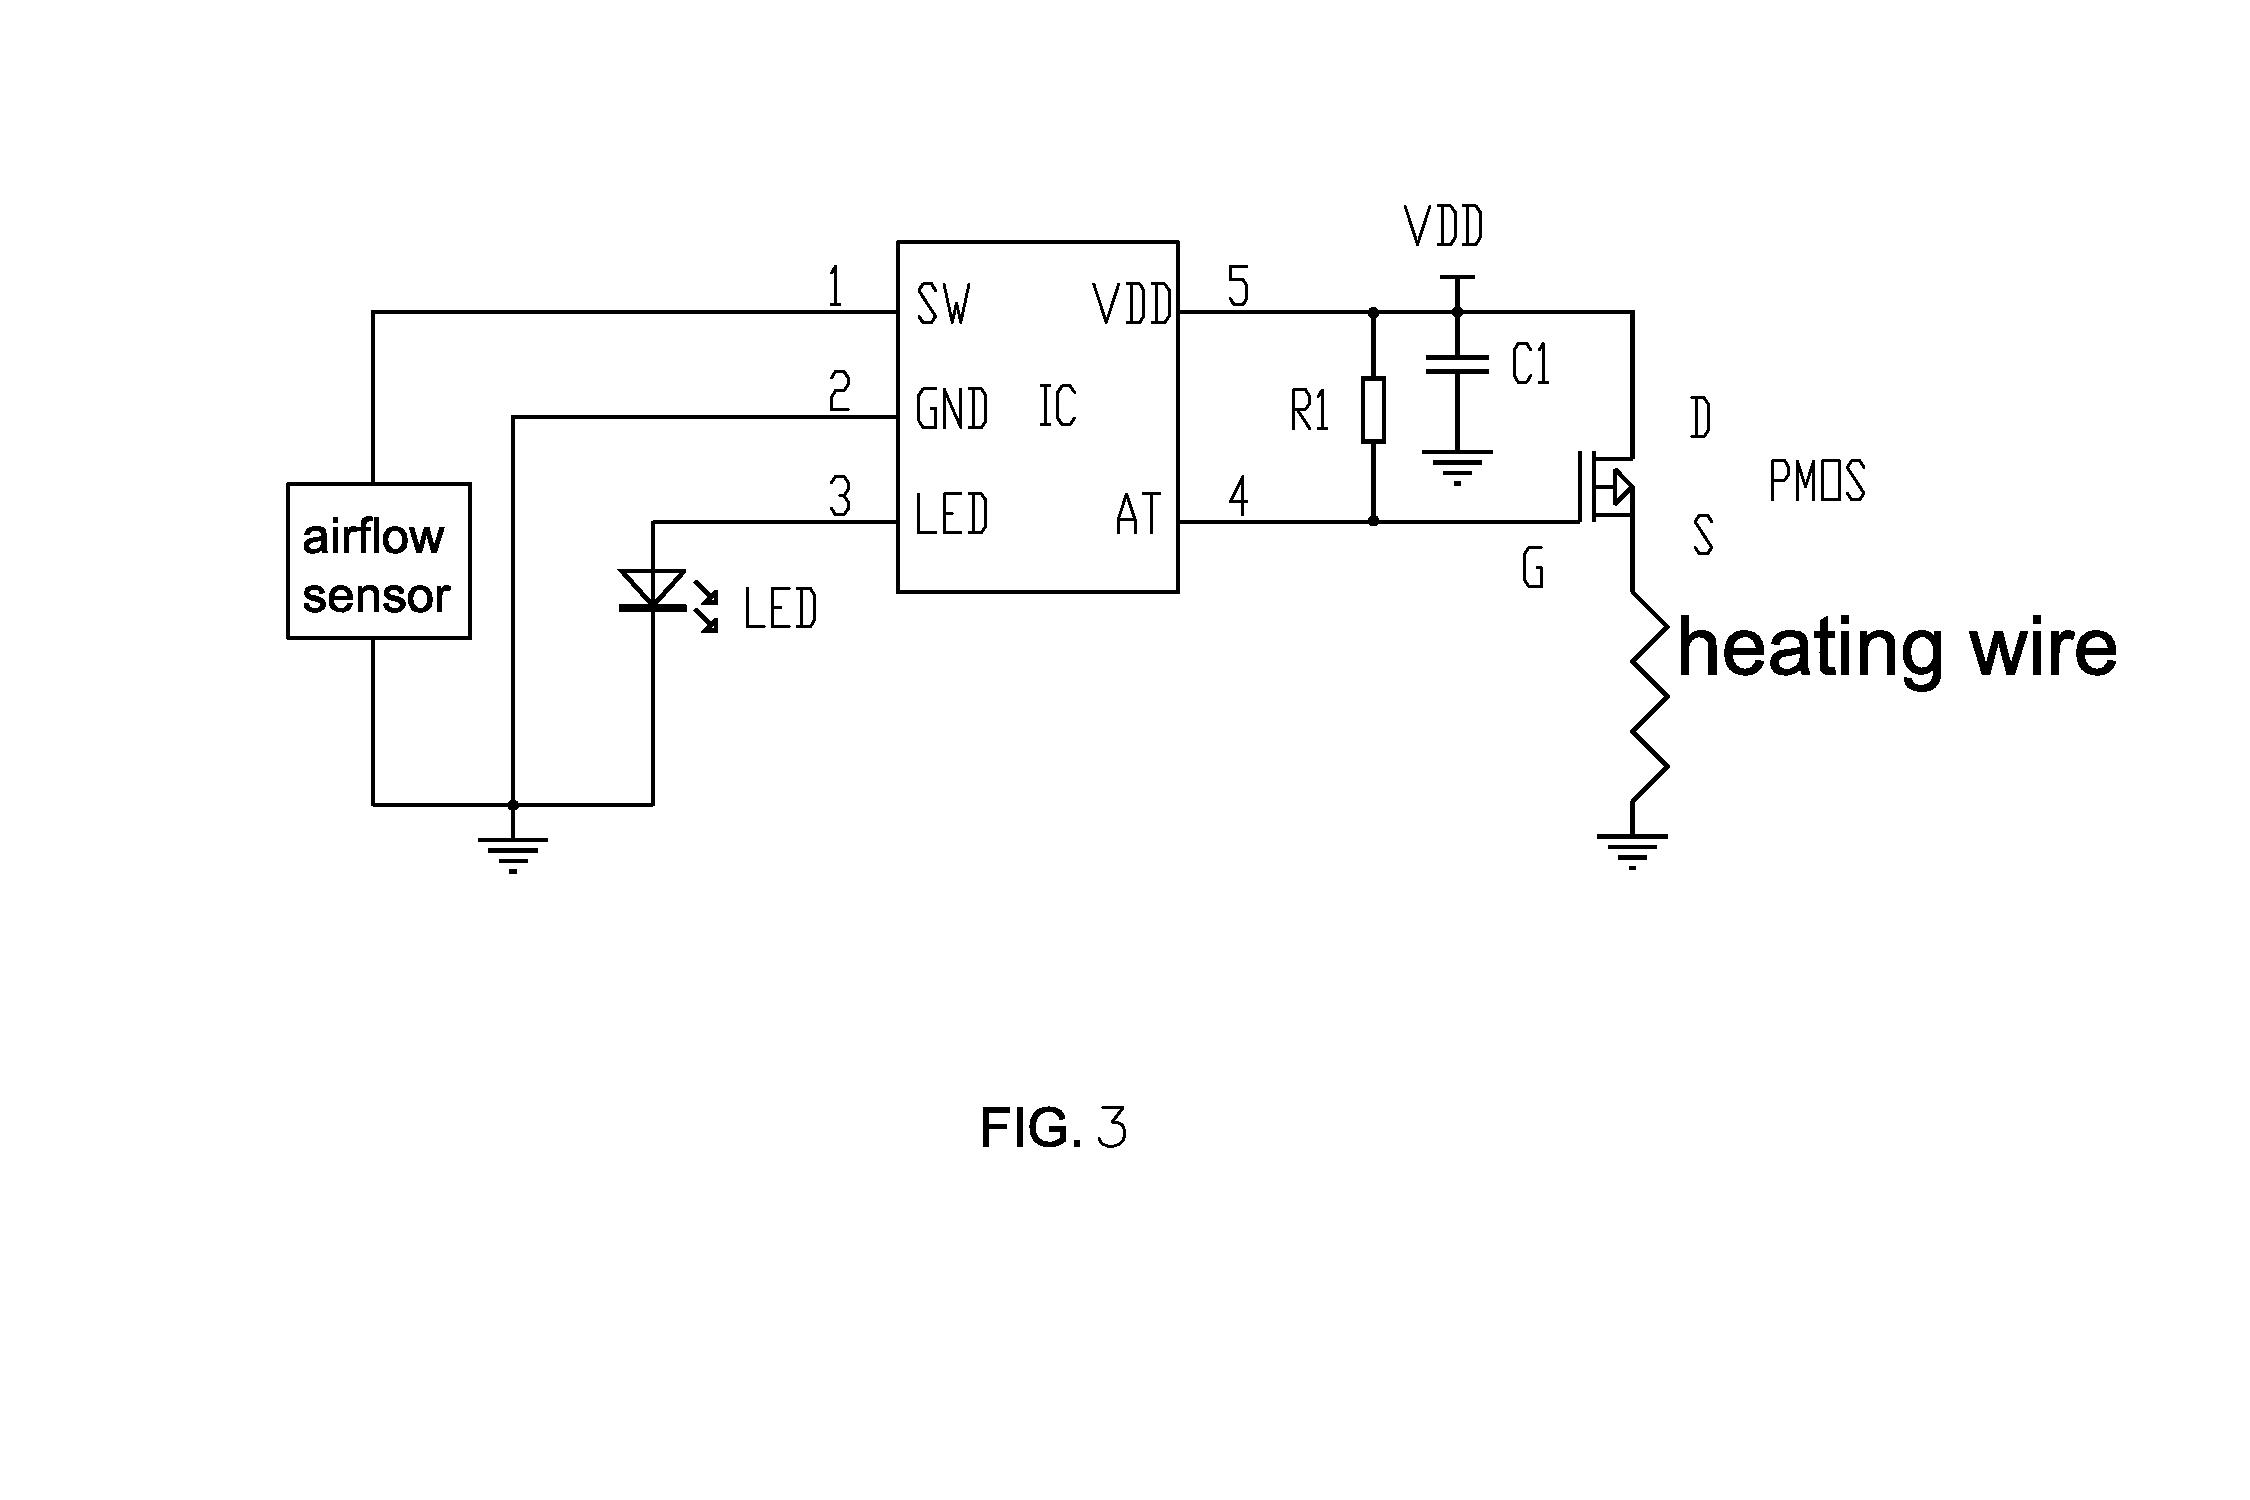 e cigarette circuit diagram wiring diagram detailed Electronic Cigarettes e cigarette circuit diagram wiring diagram e cigarette symbol e cigarette circuit diagram